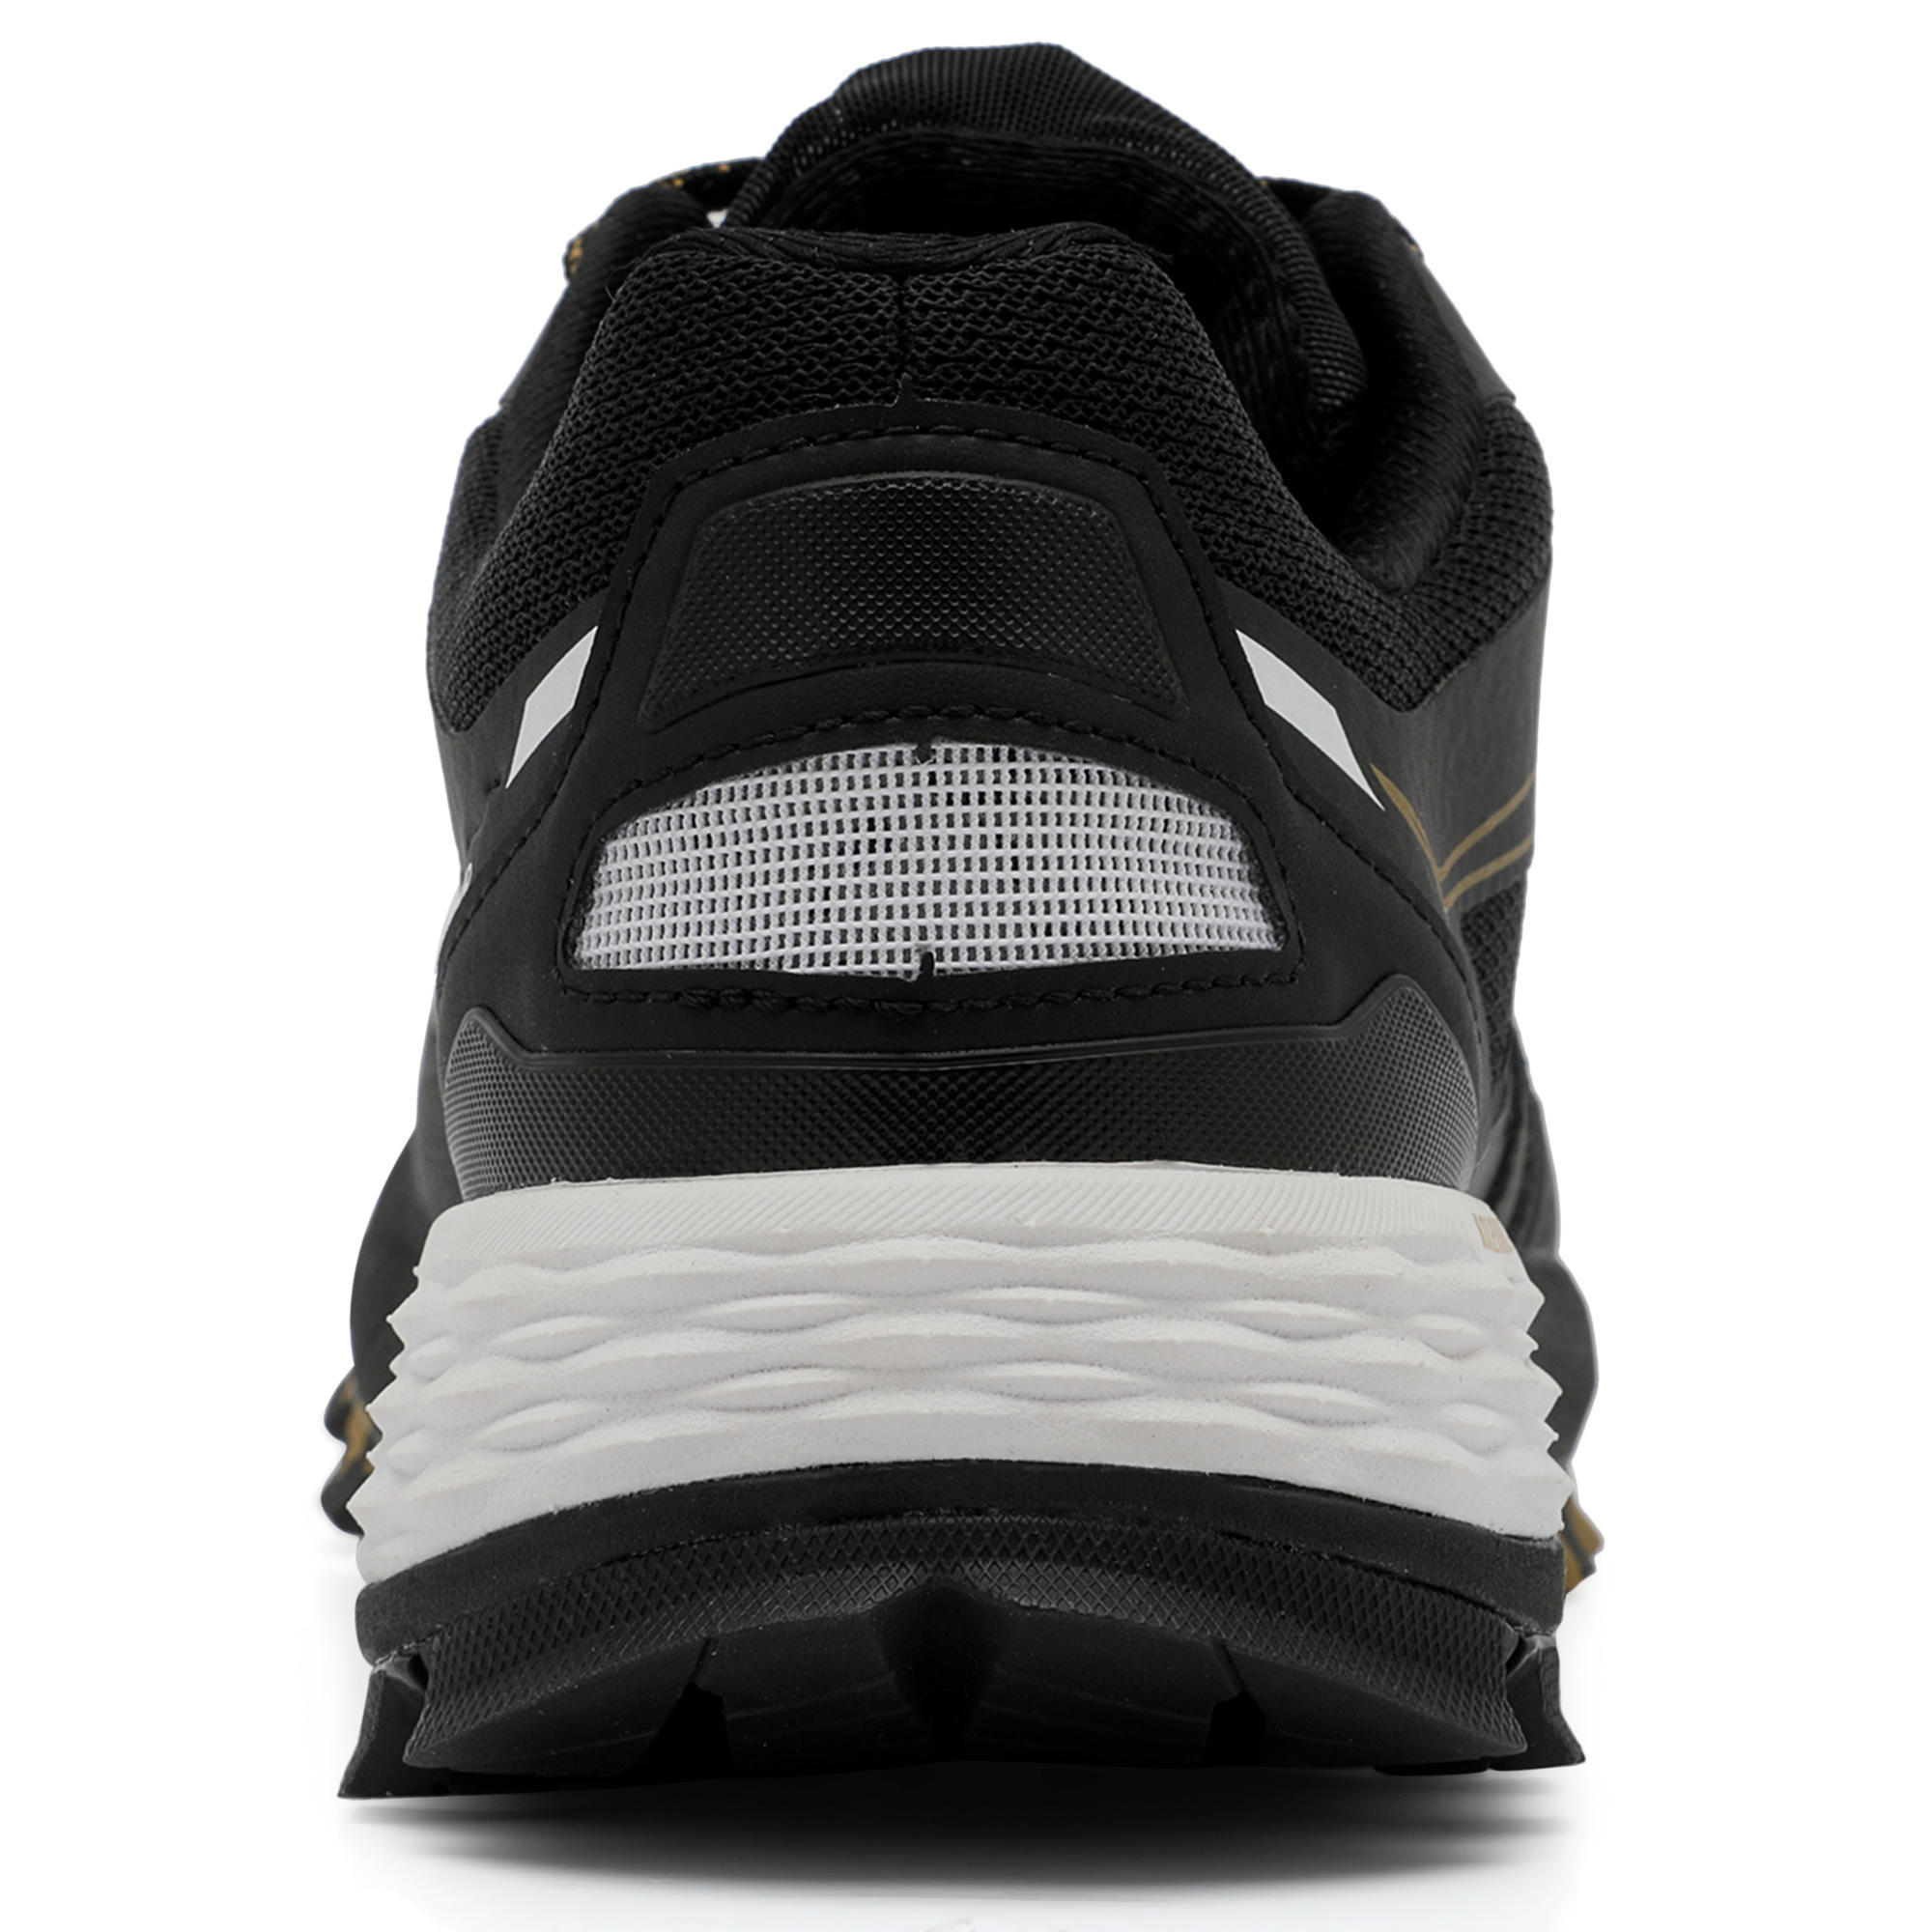 MT2 TRAIL RUNNING SHOES - BLACK/BRONZE